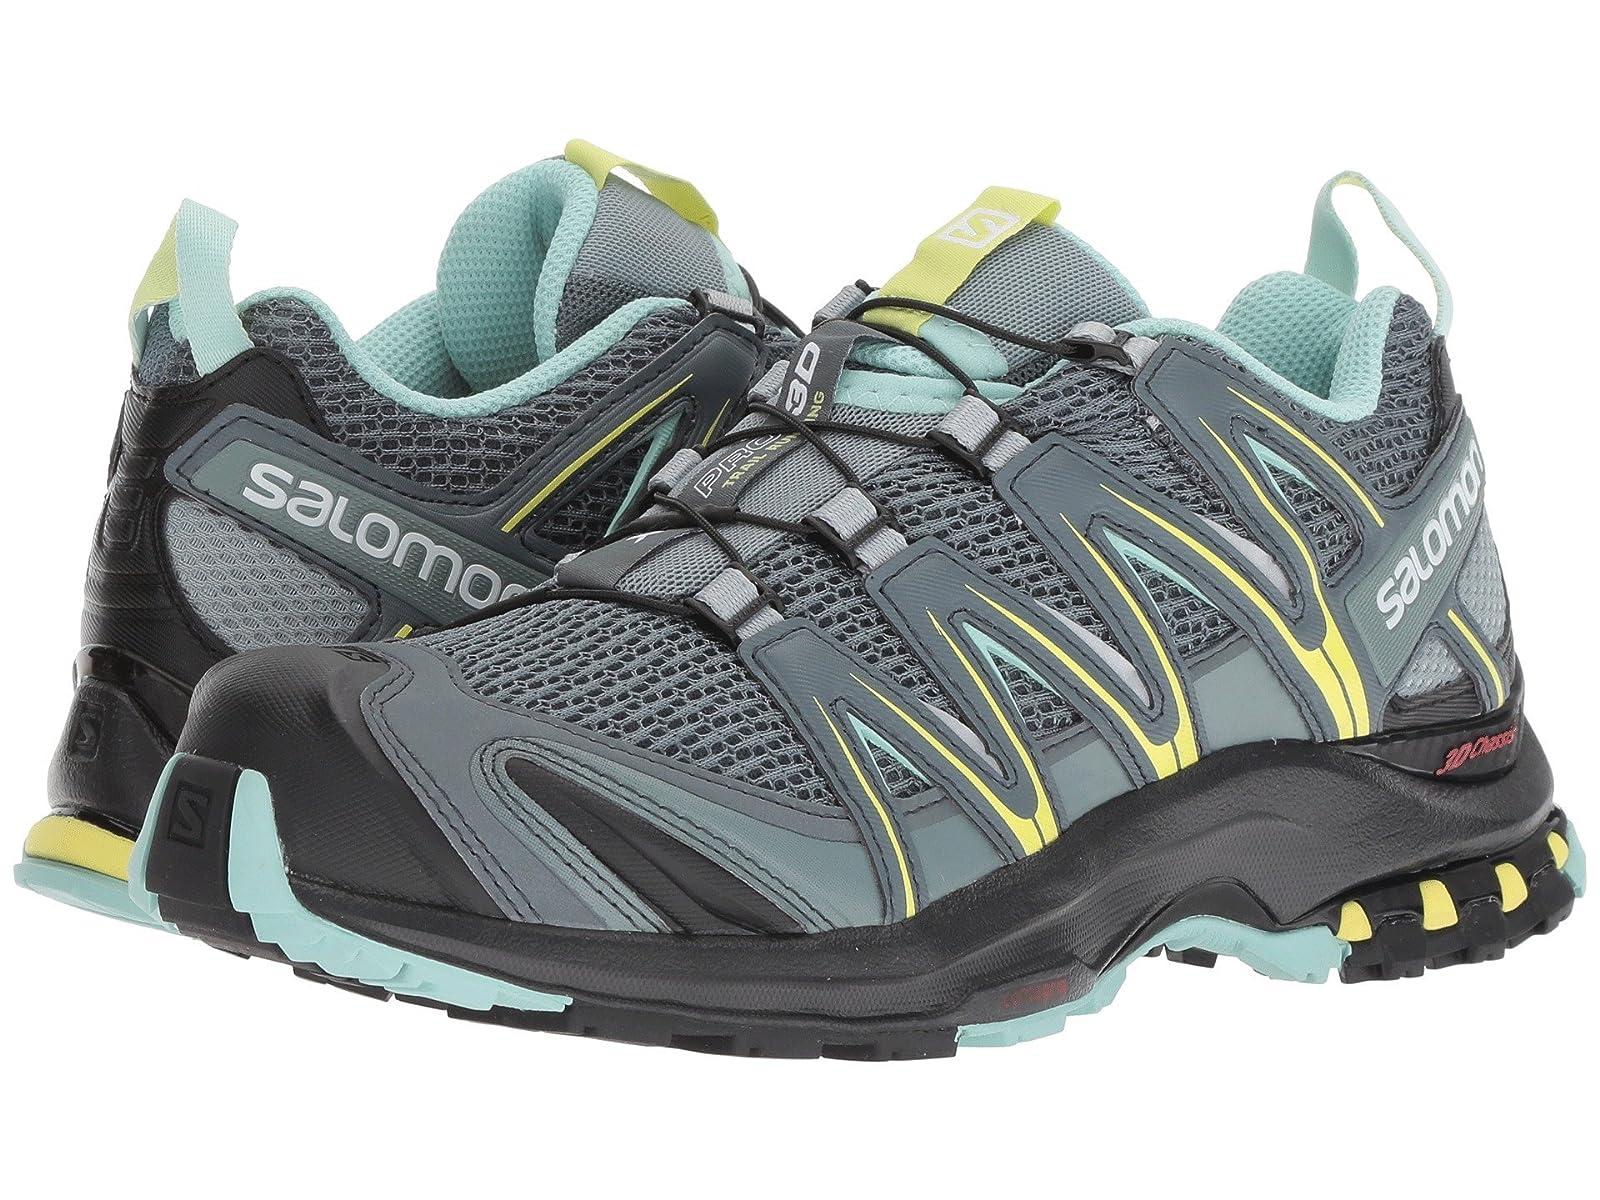 Salomon XA Pro 3DAtmospheric grades have affordable shoes